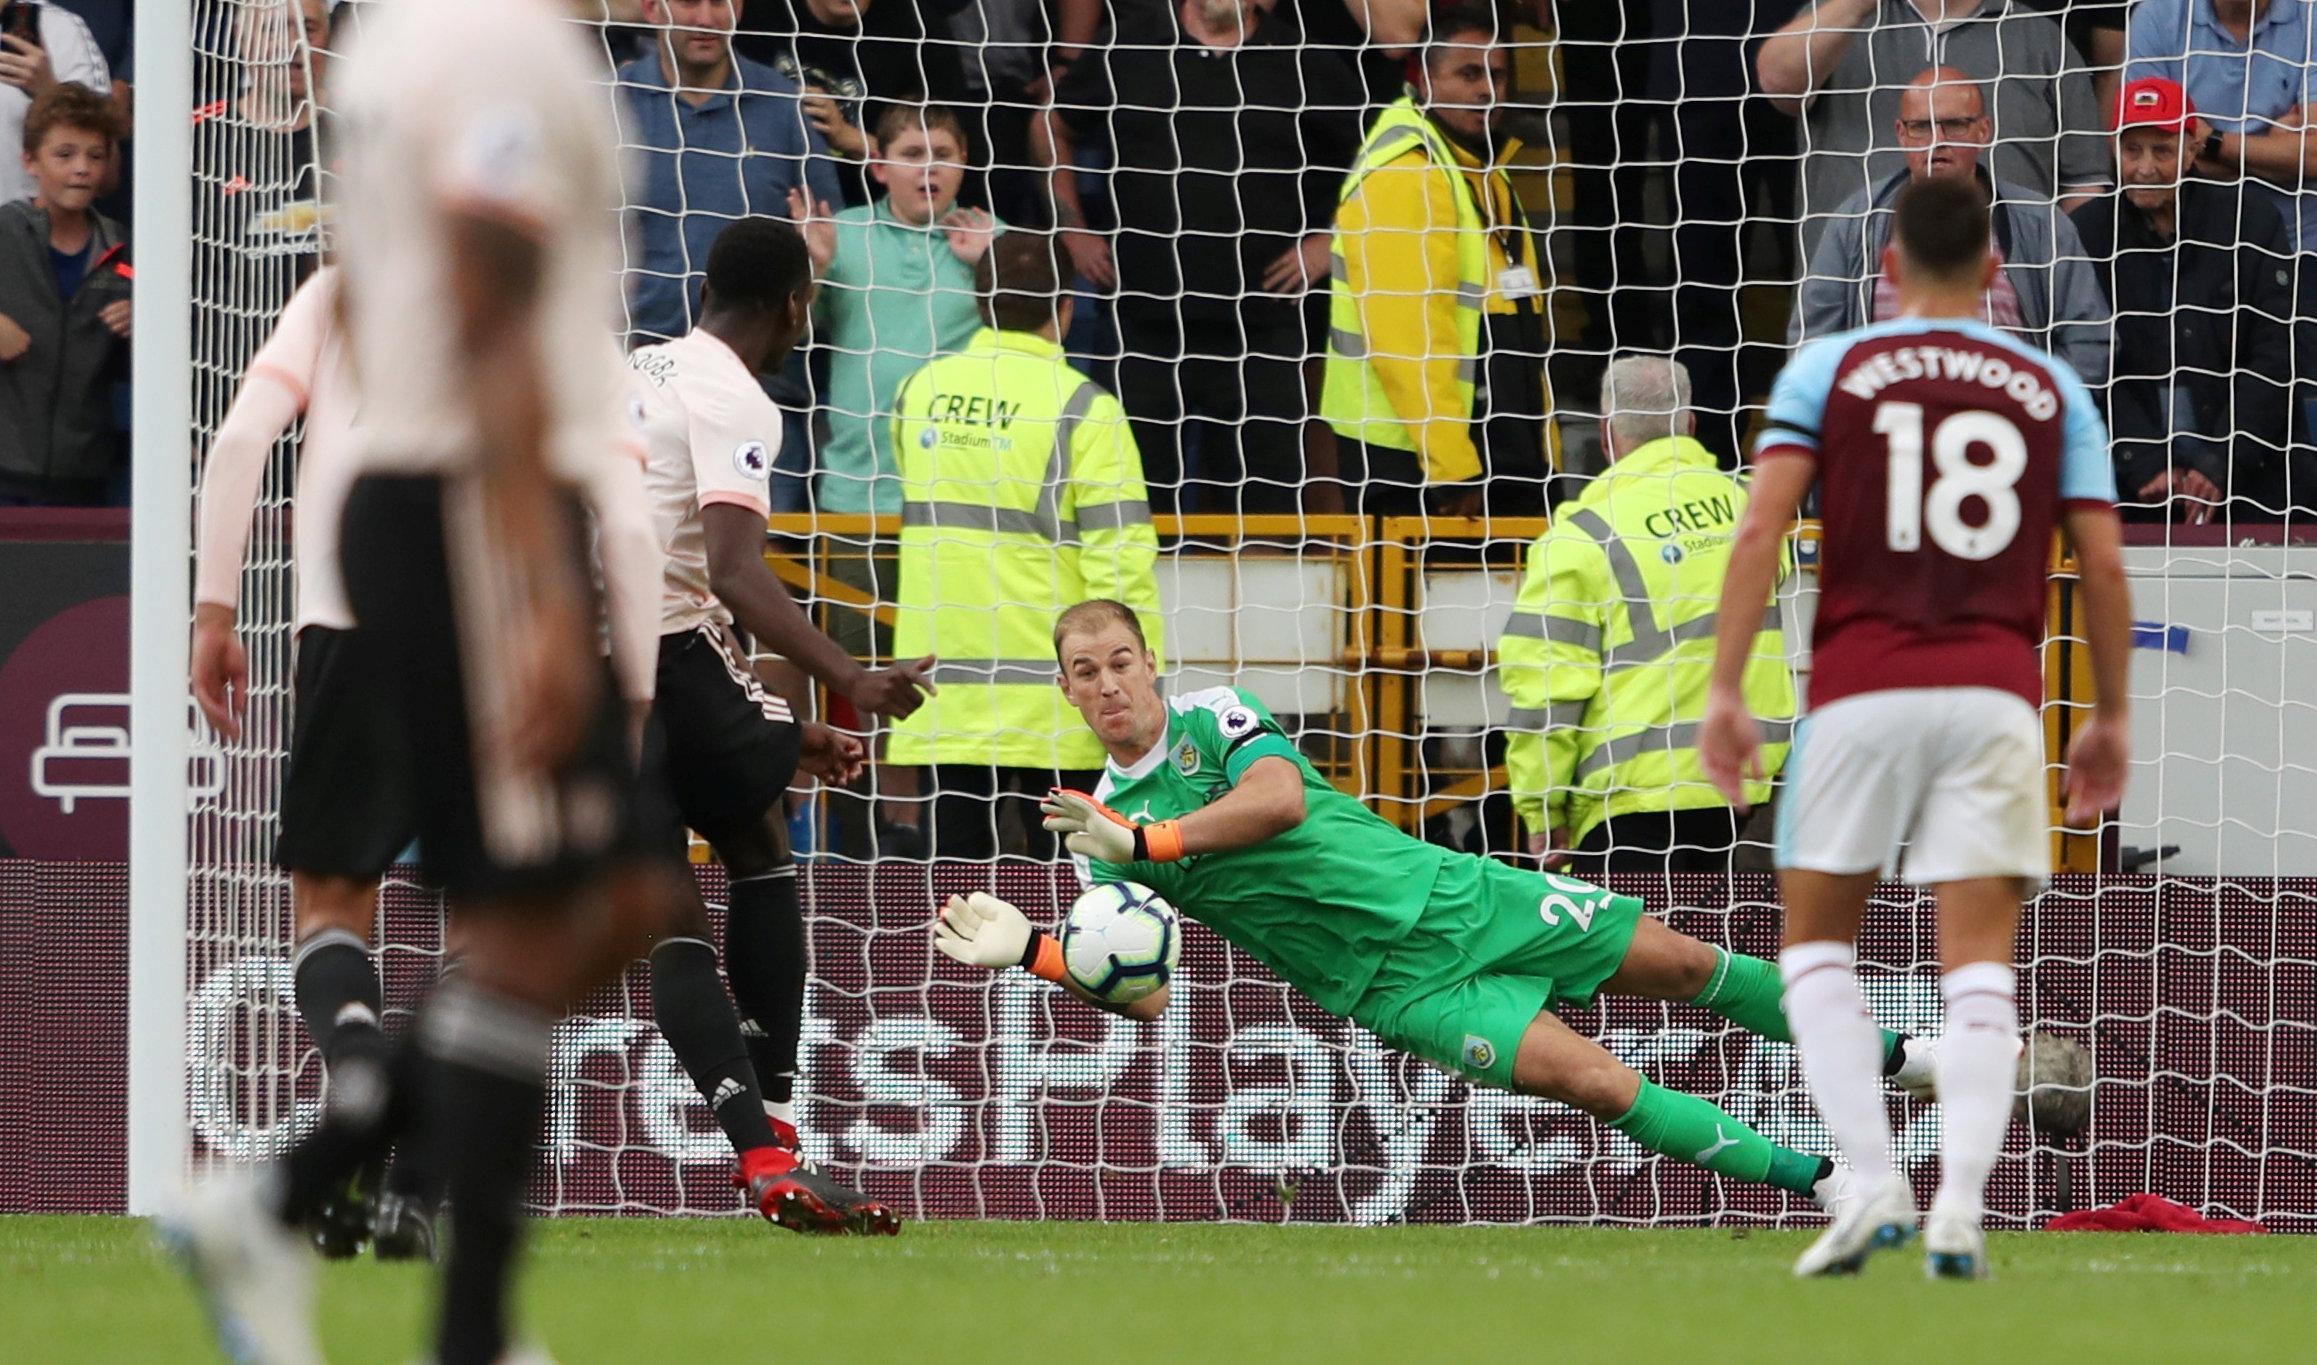 Joe Hart saved a second half penalty from Paul Pogba